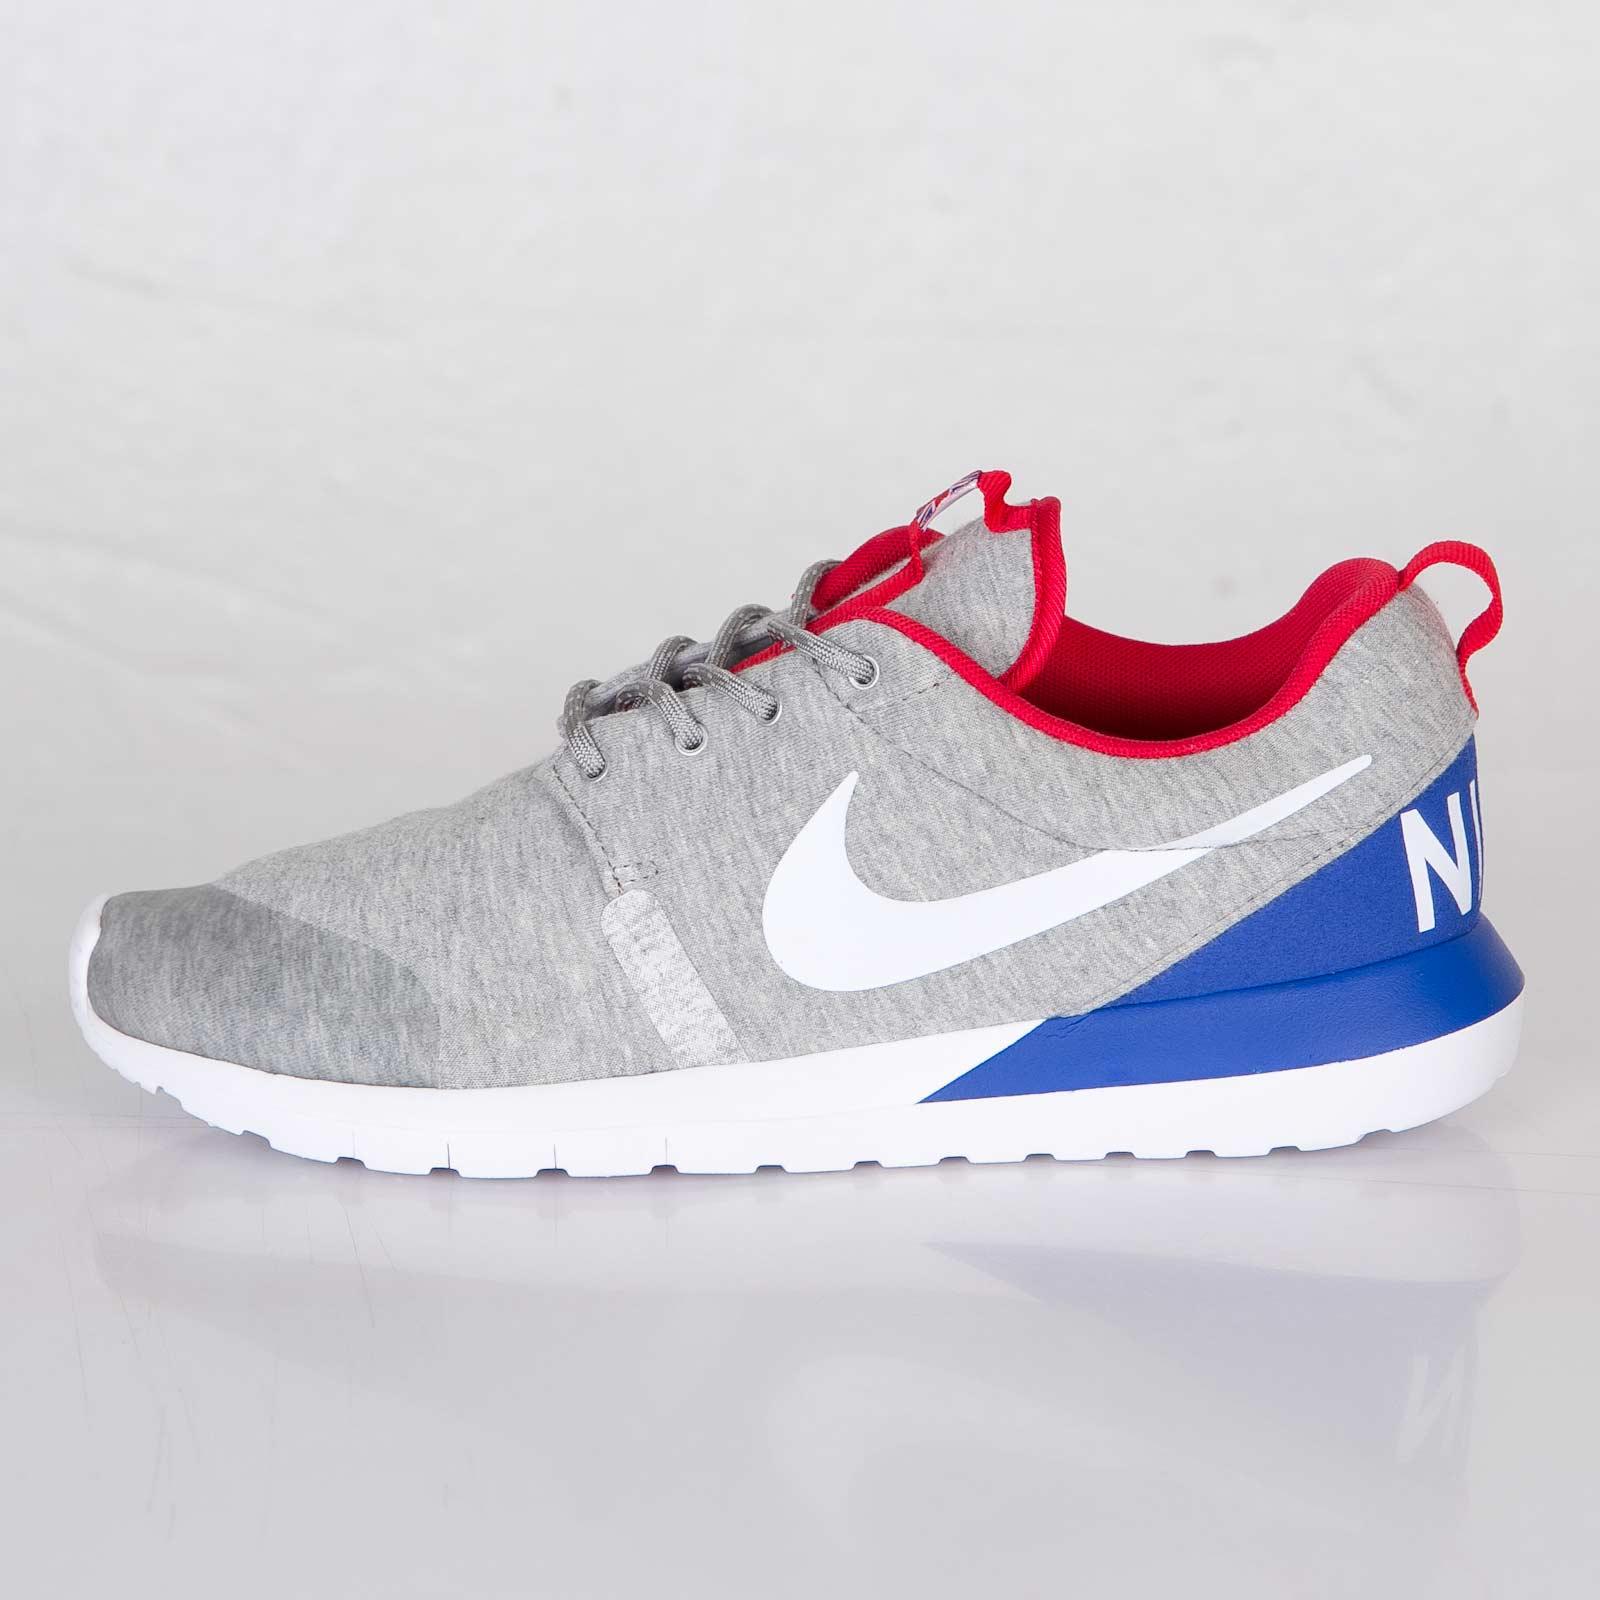 4383d1da717d5 Nike Roshe Run NM W SP - 652804-016 - Sneakersnstuff